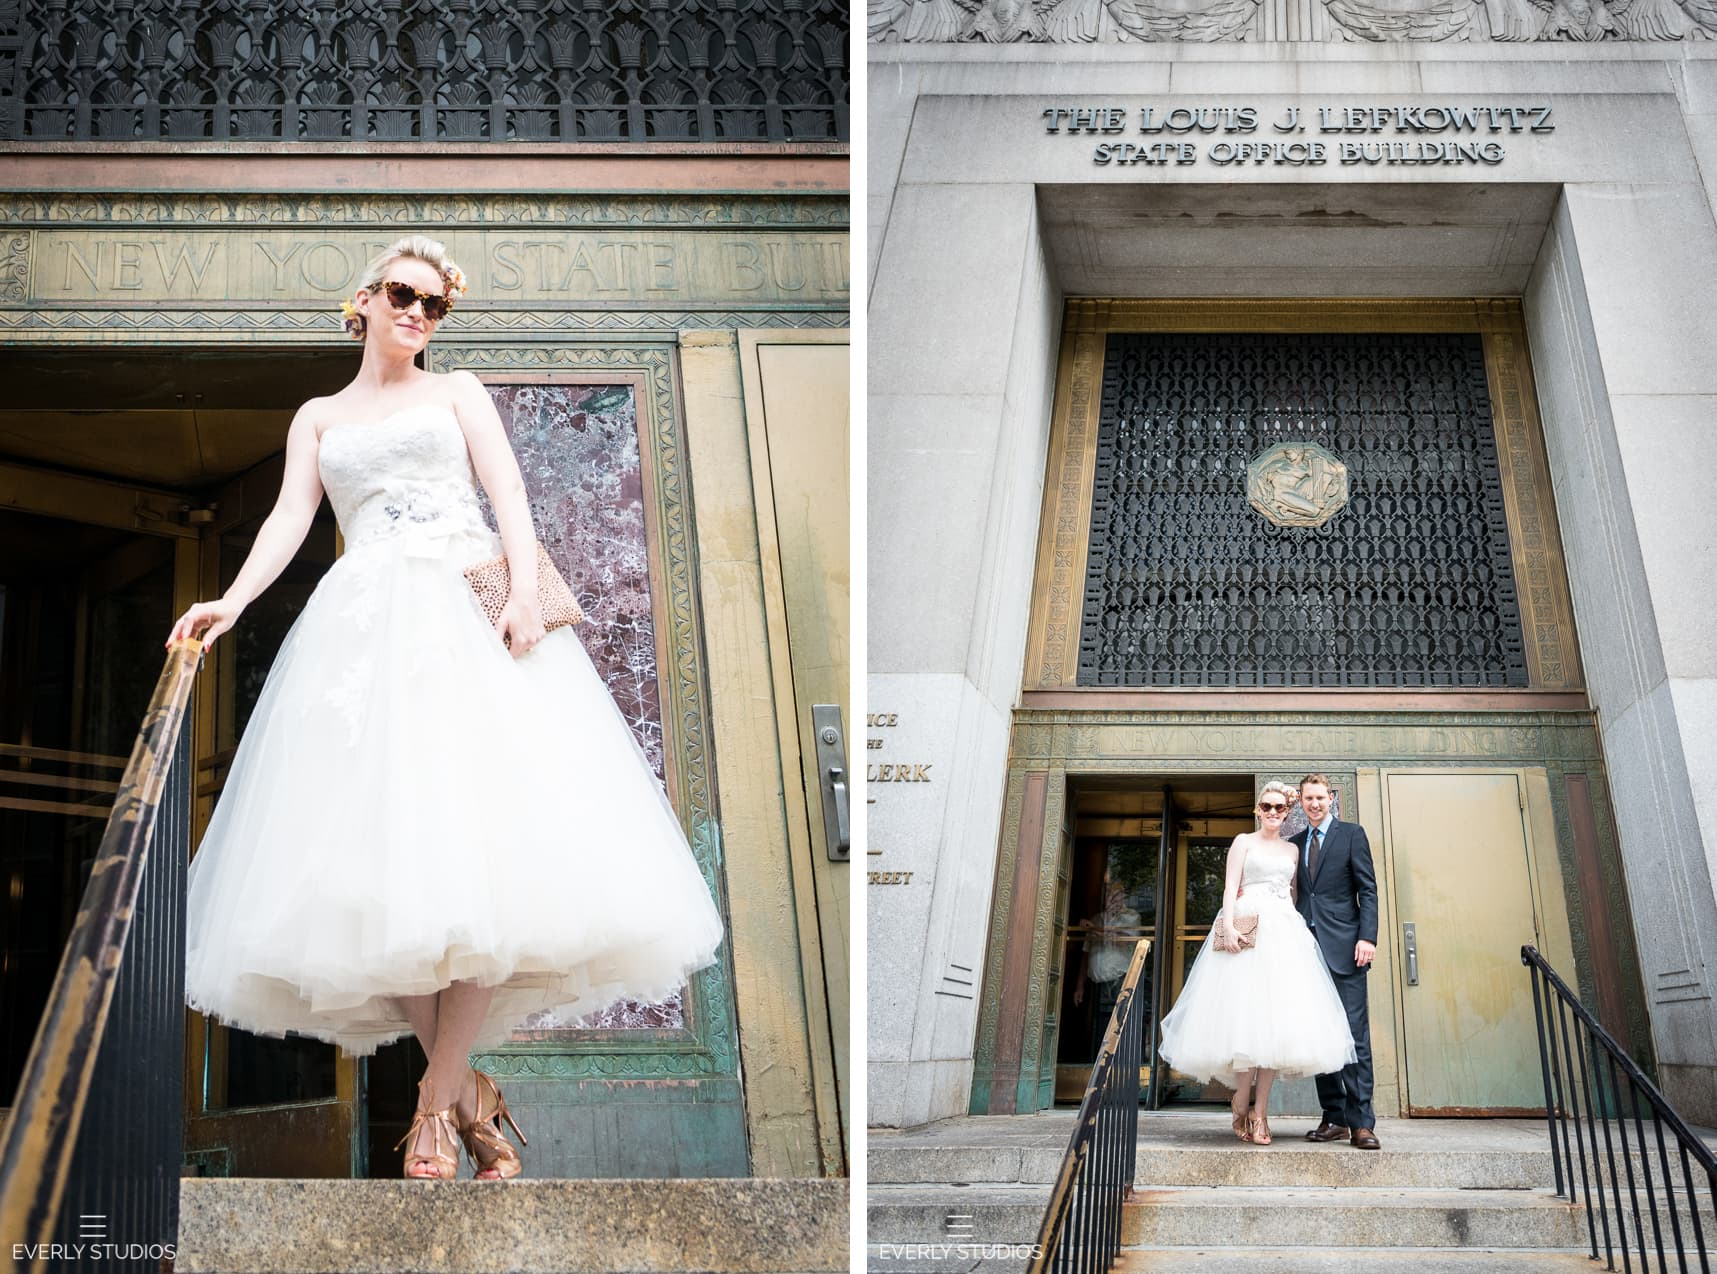 new york city hall wedding photos by everly studios wwweverlystudioscom